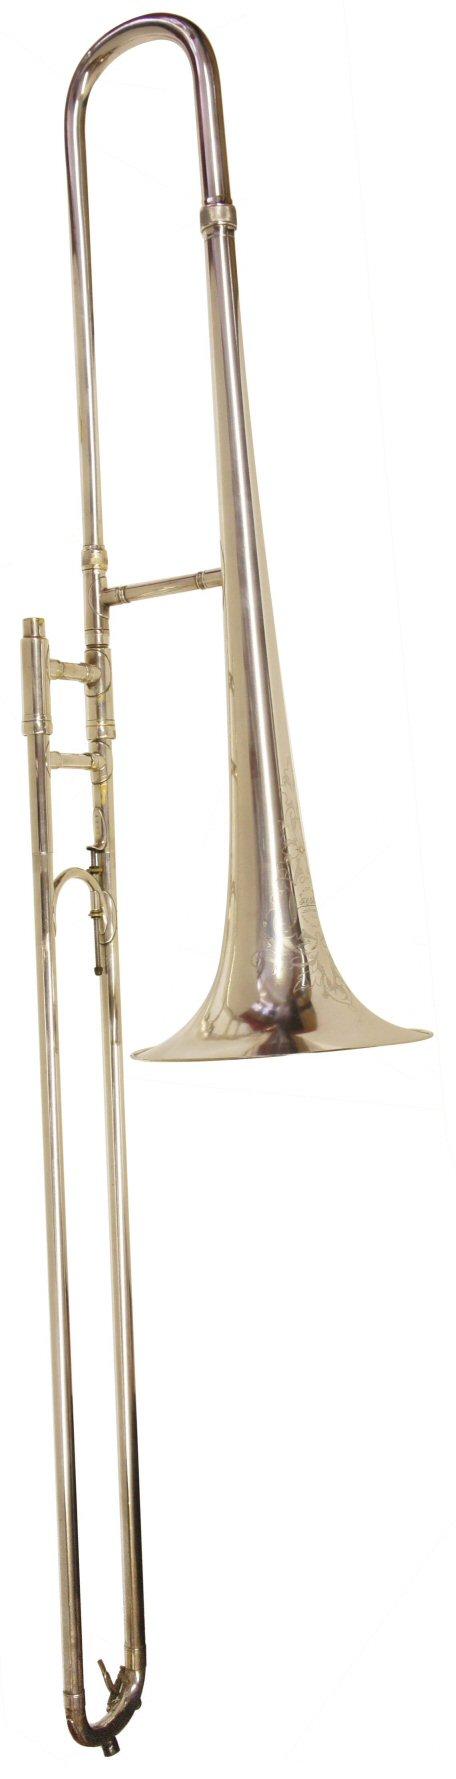 Vintage Olds Trombone C1920